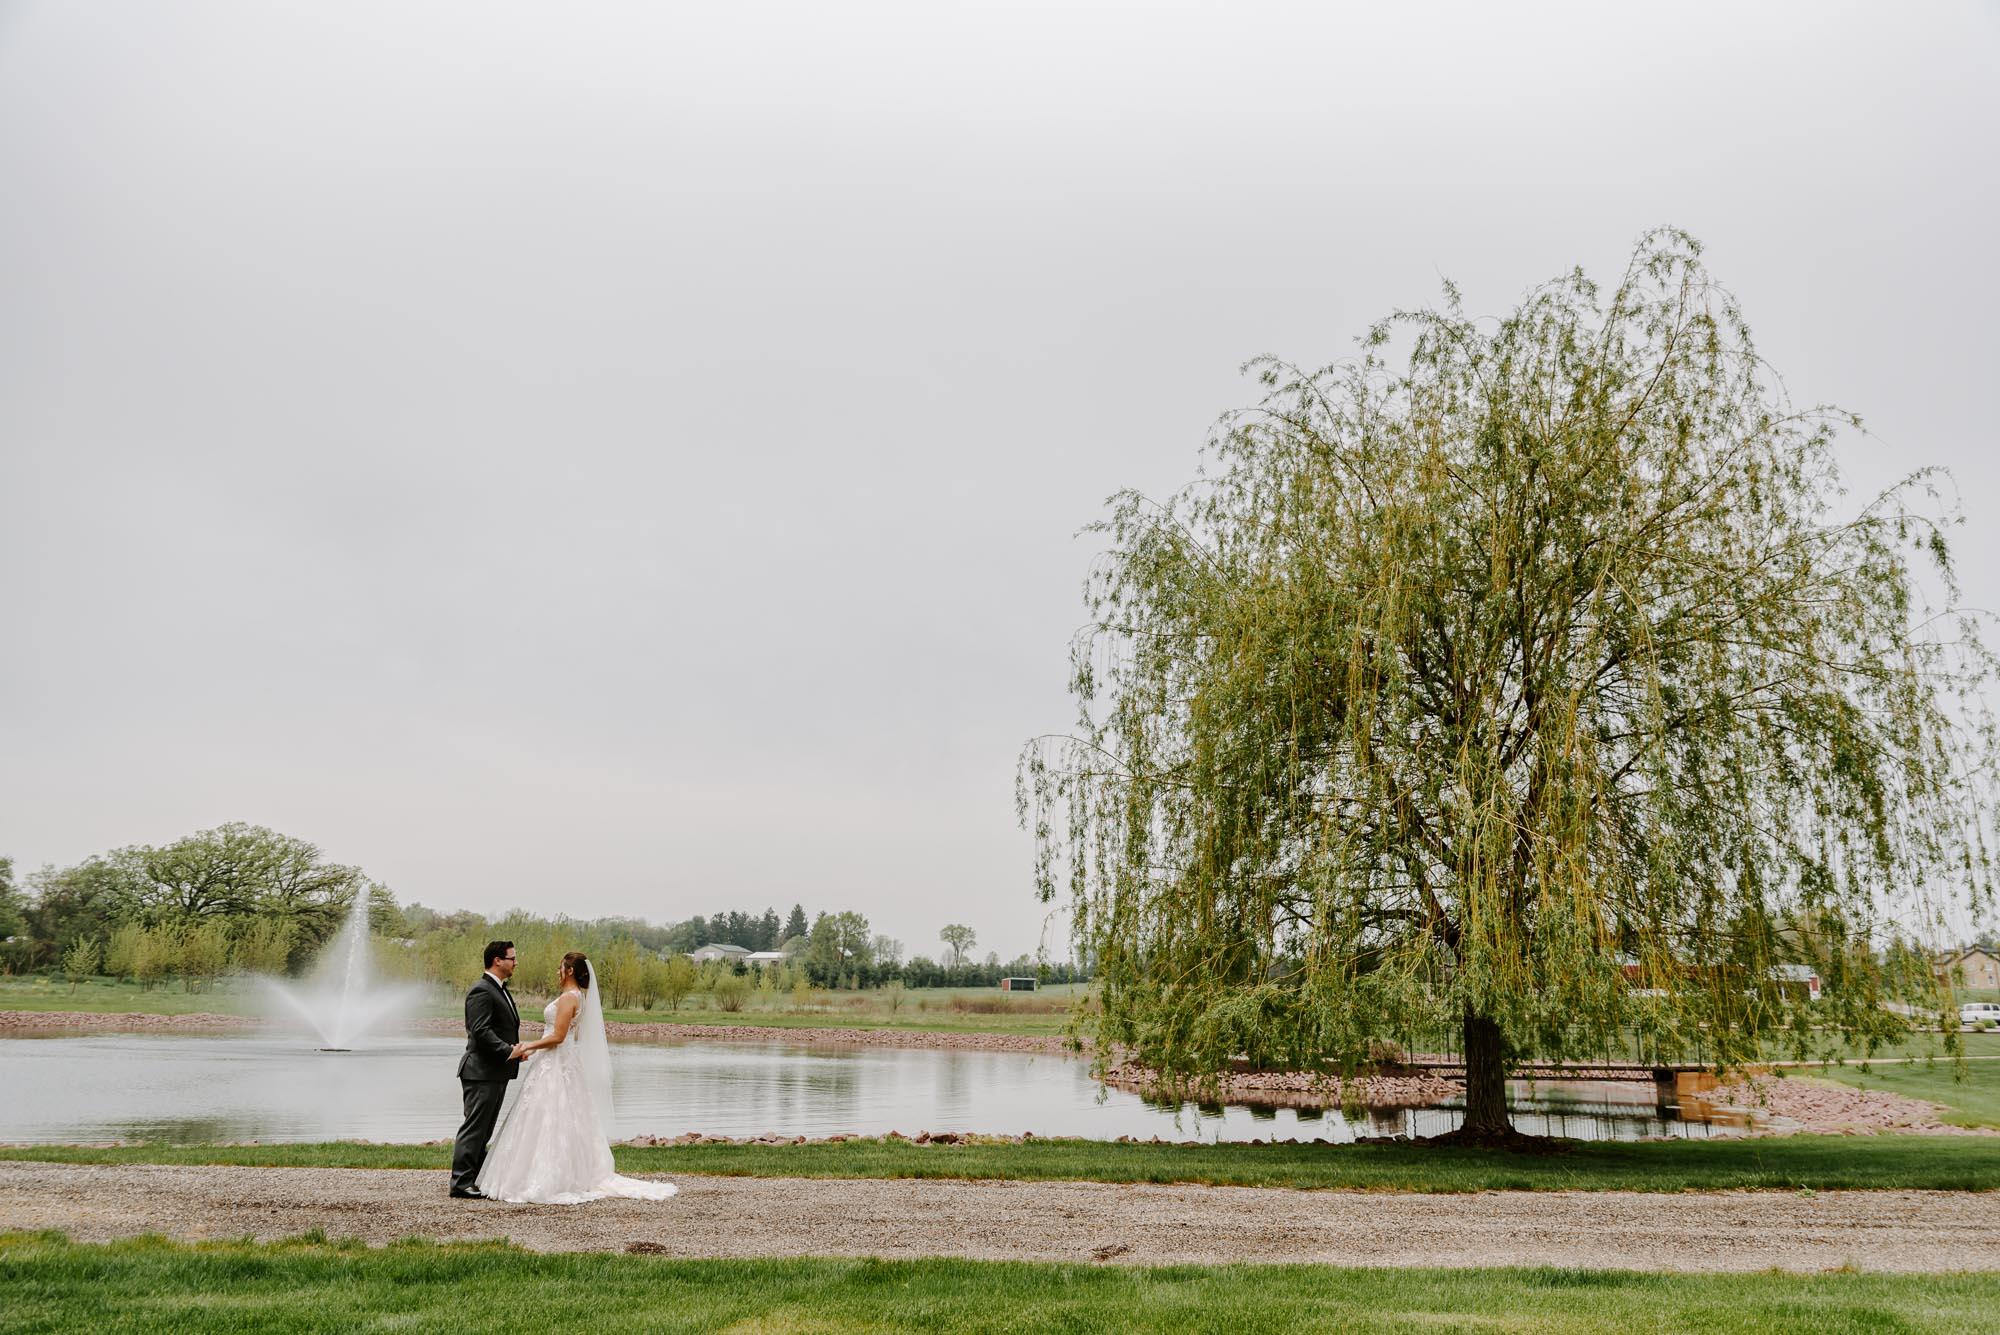 orchard-farms-pavillion-wedding-rockton-IL-wedding-photographers-97.jpg